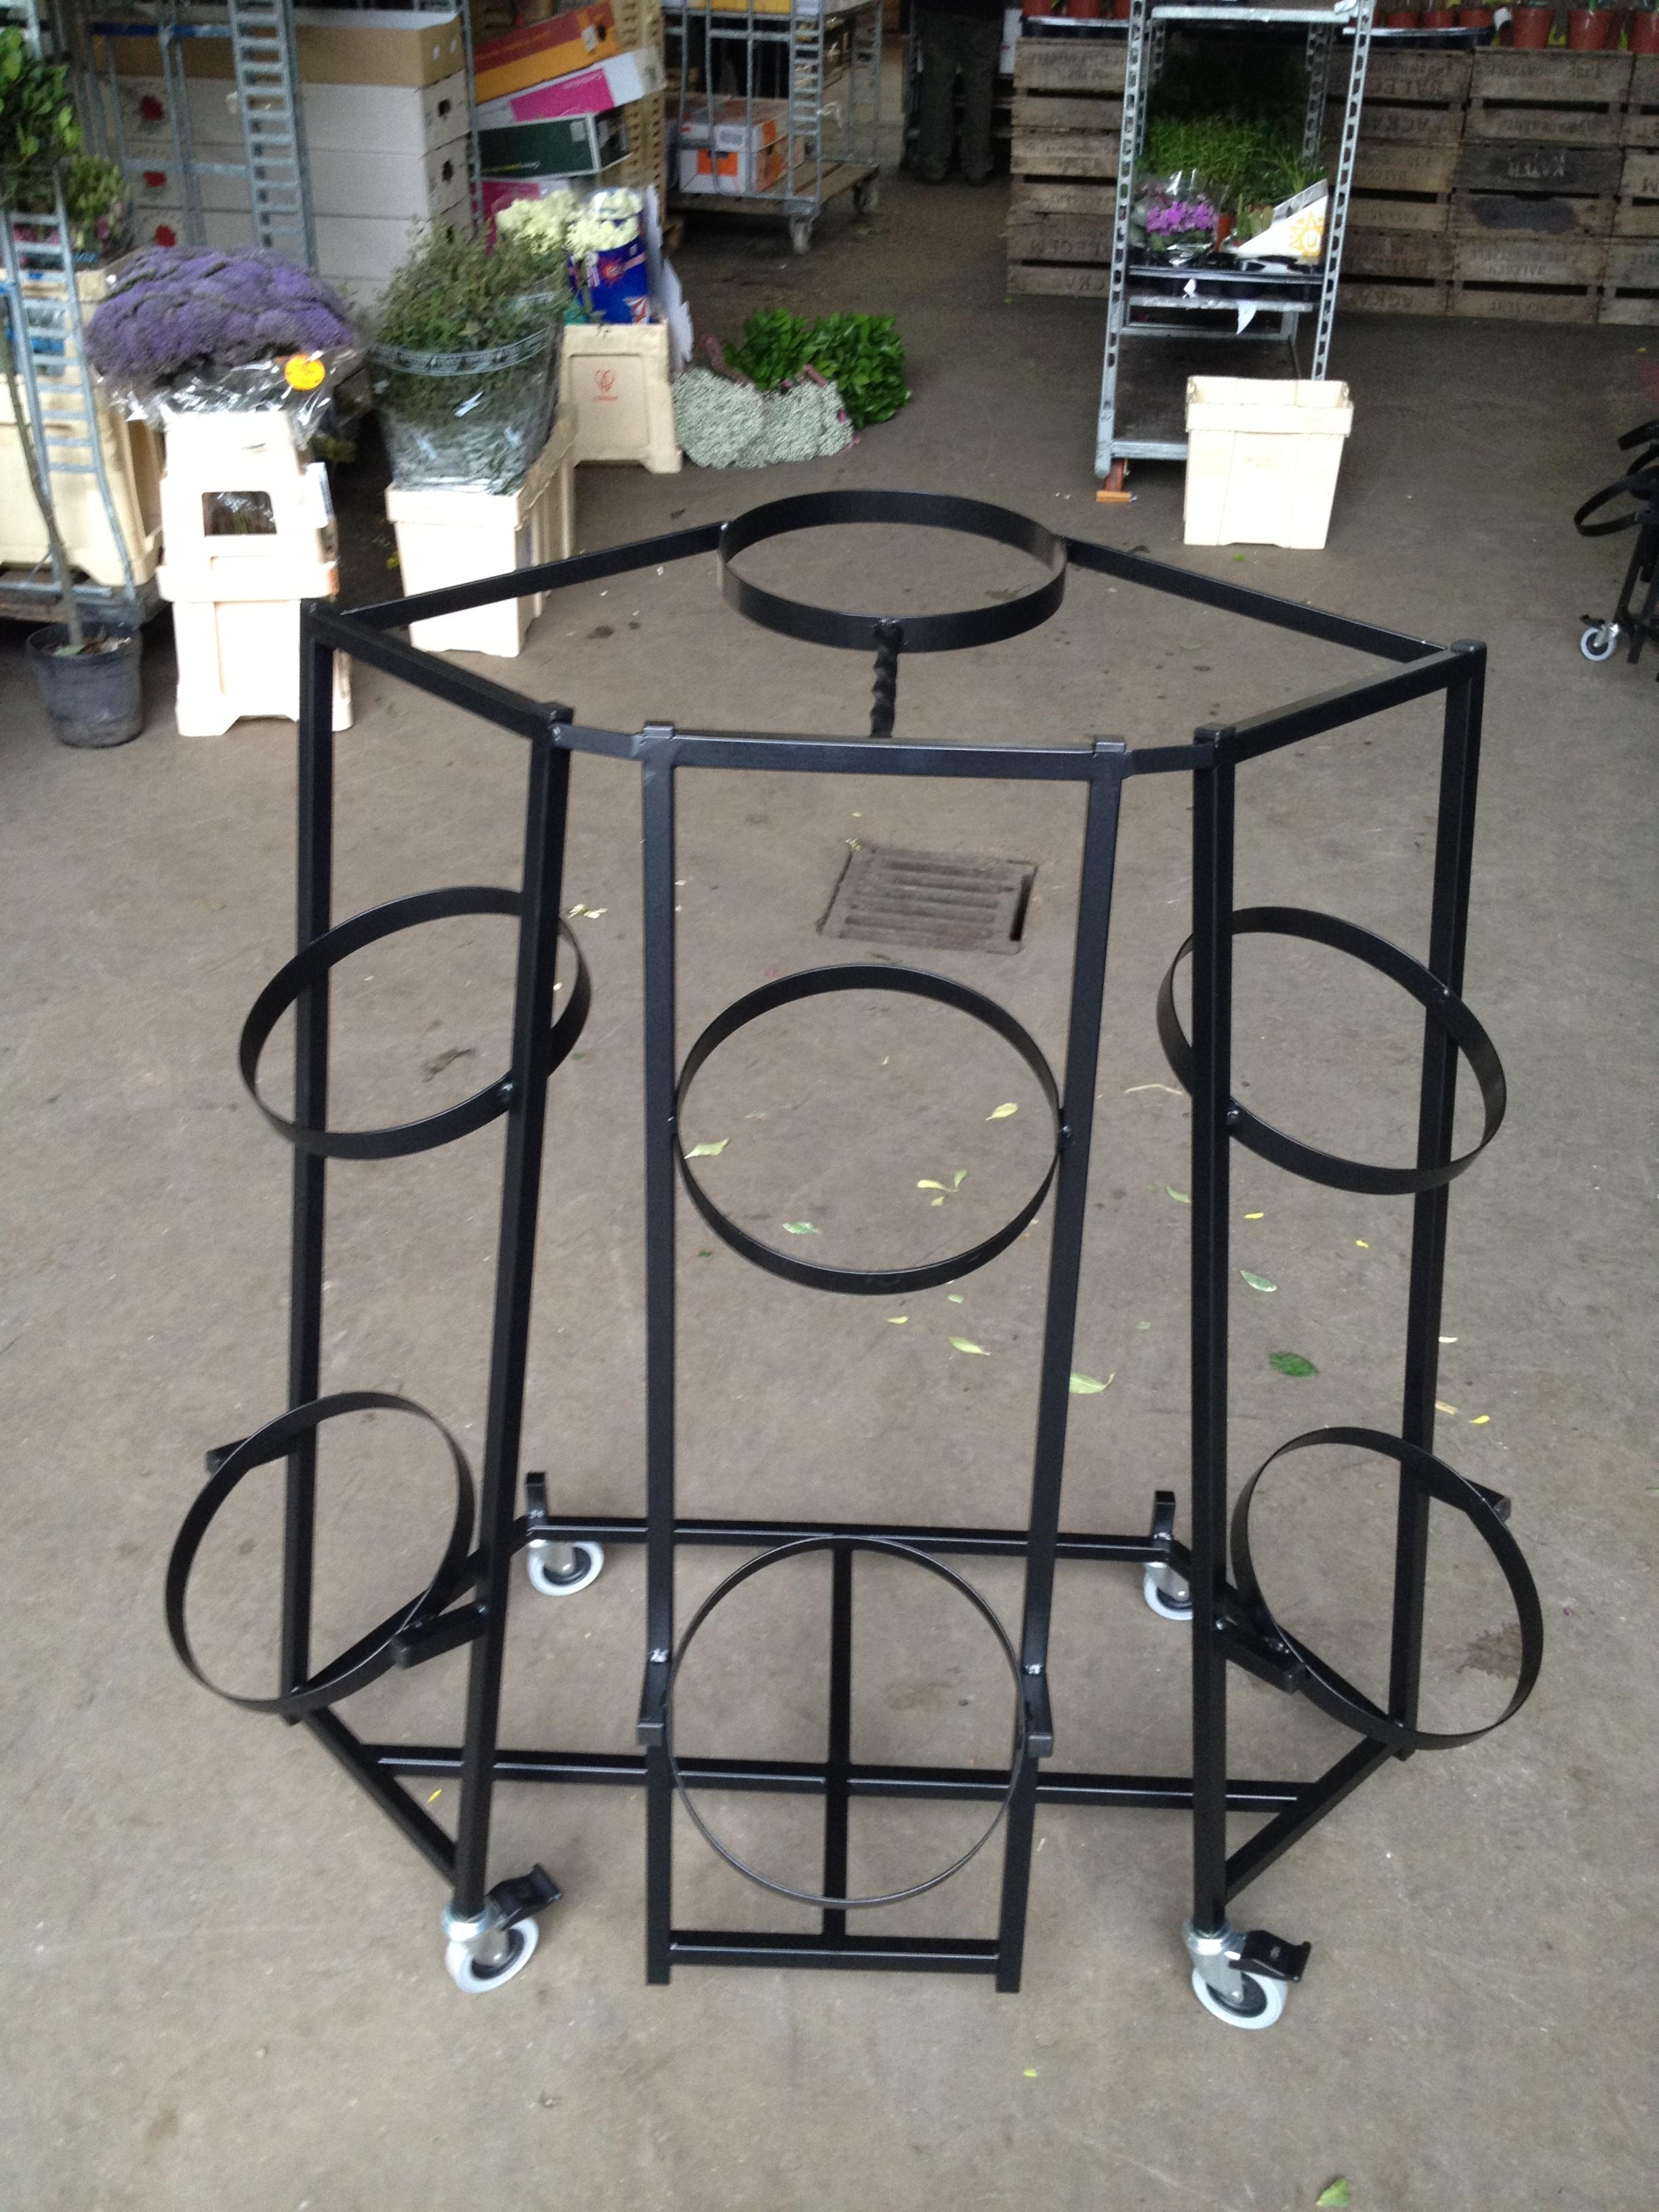 7 Bucket Flower Display Stand